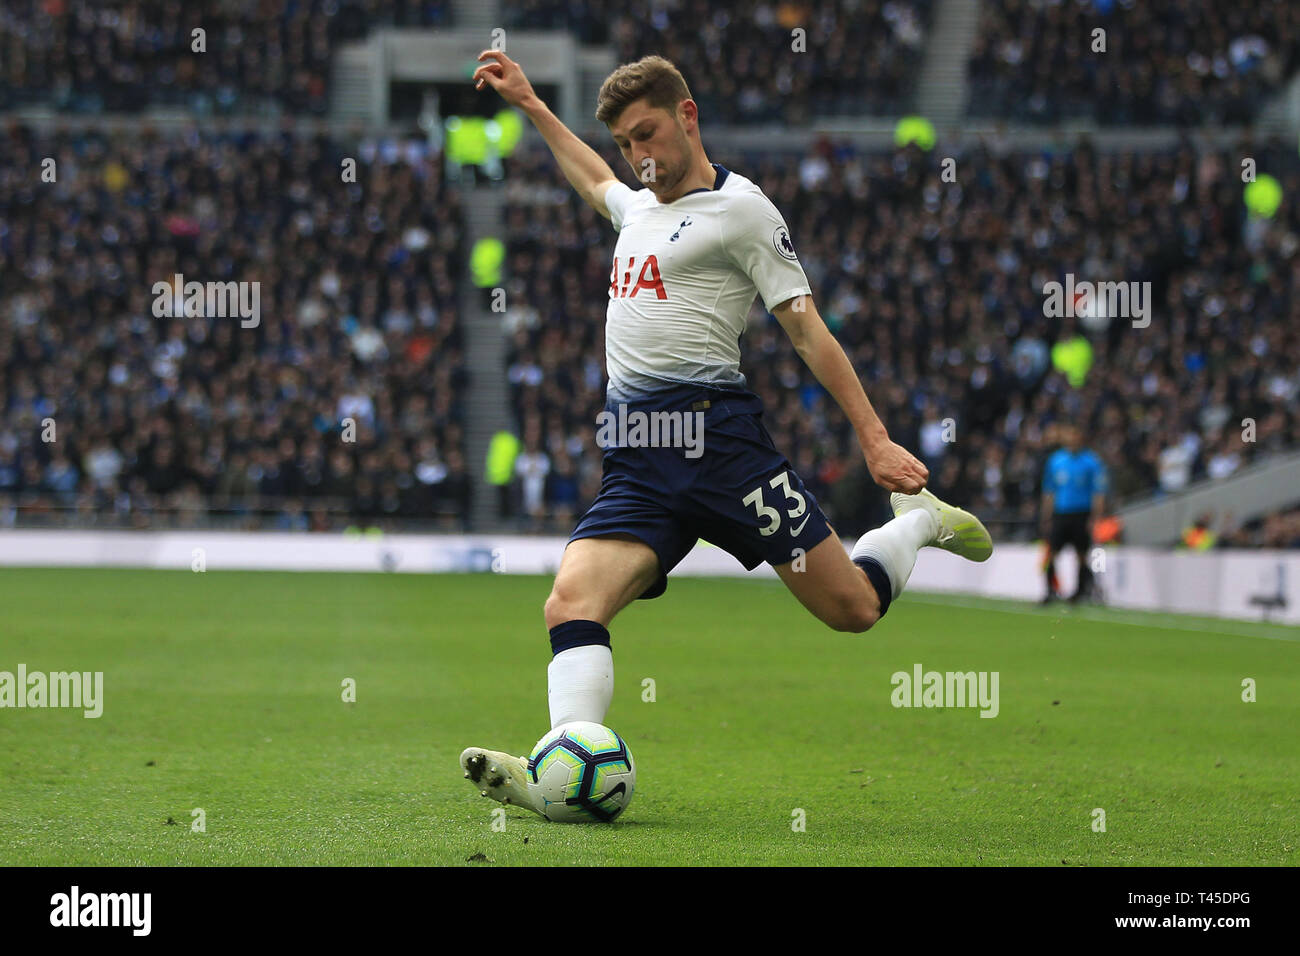 7247cae8d Ben Davies of Tottenham Hotspur in action. Premier league match